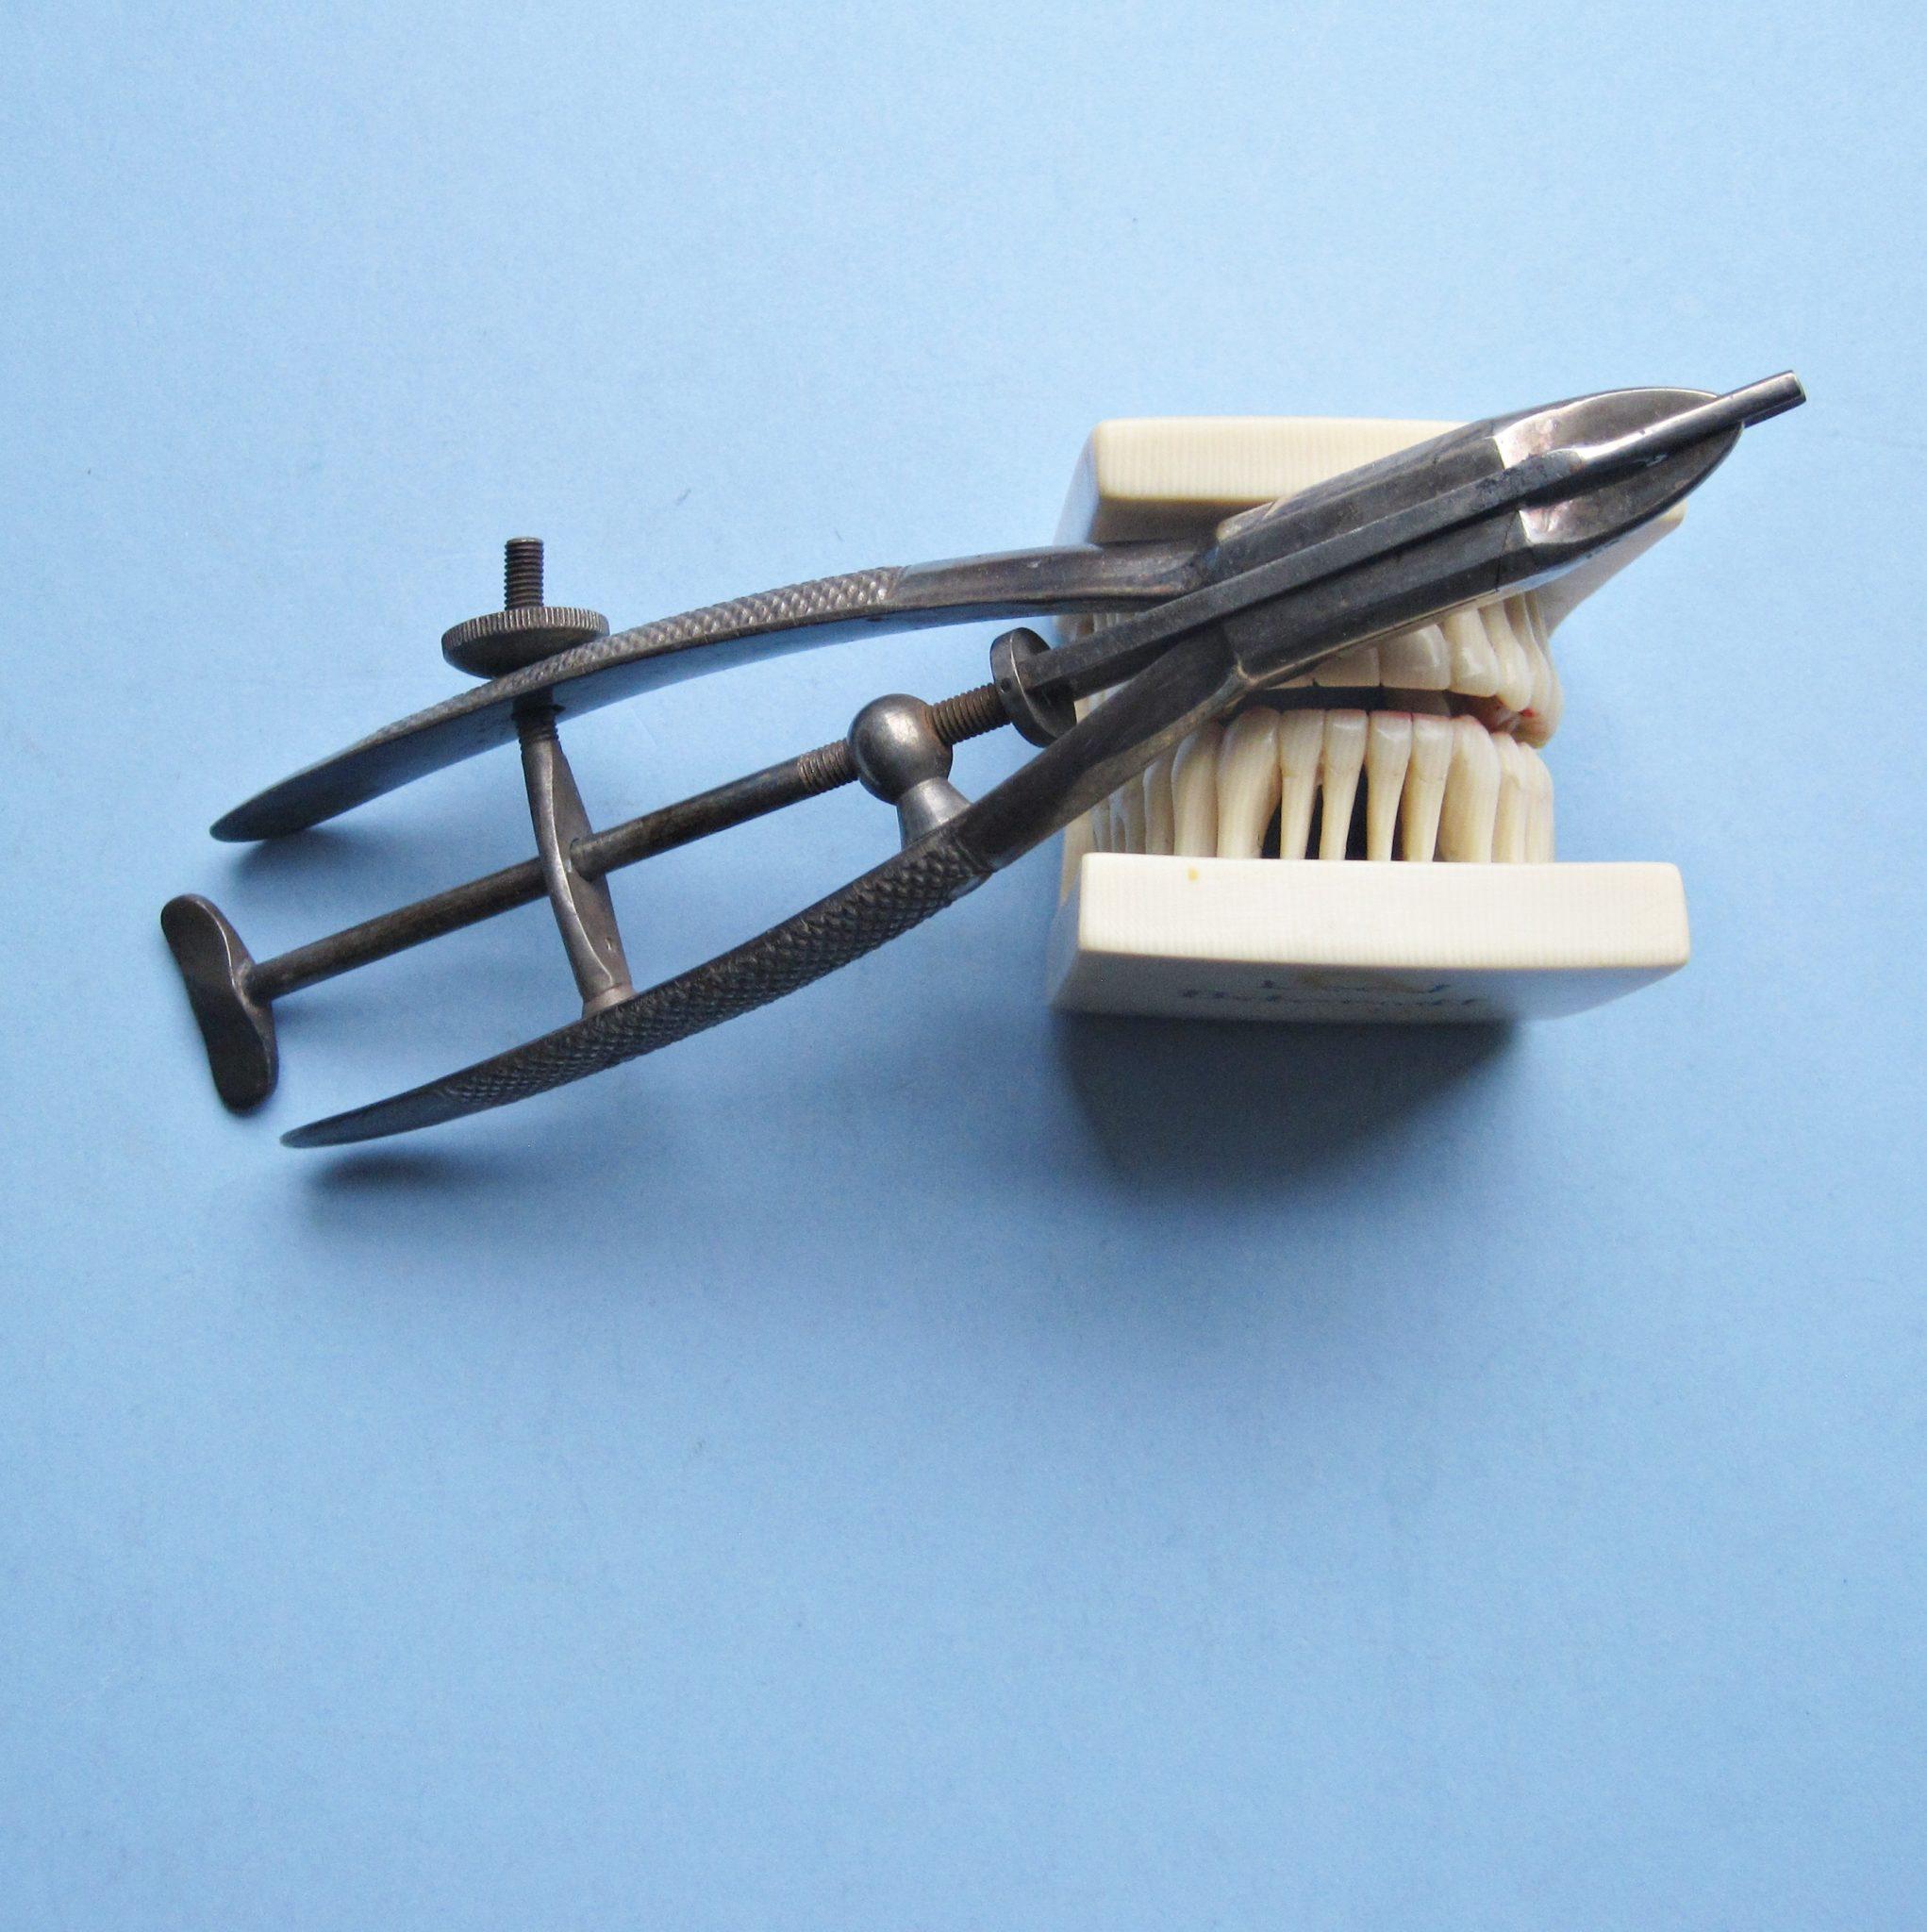 Lancaster Patent Dental Forceps